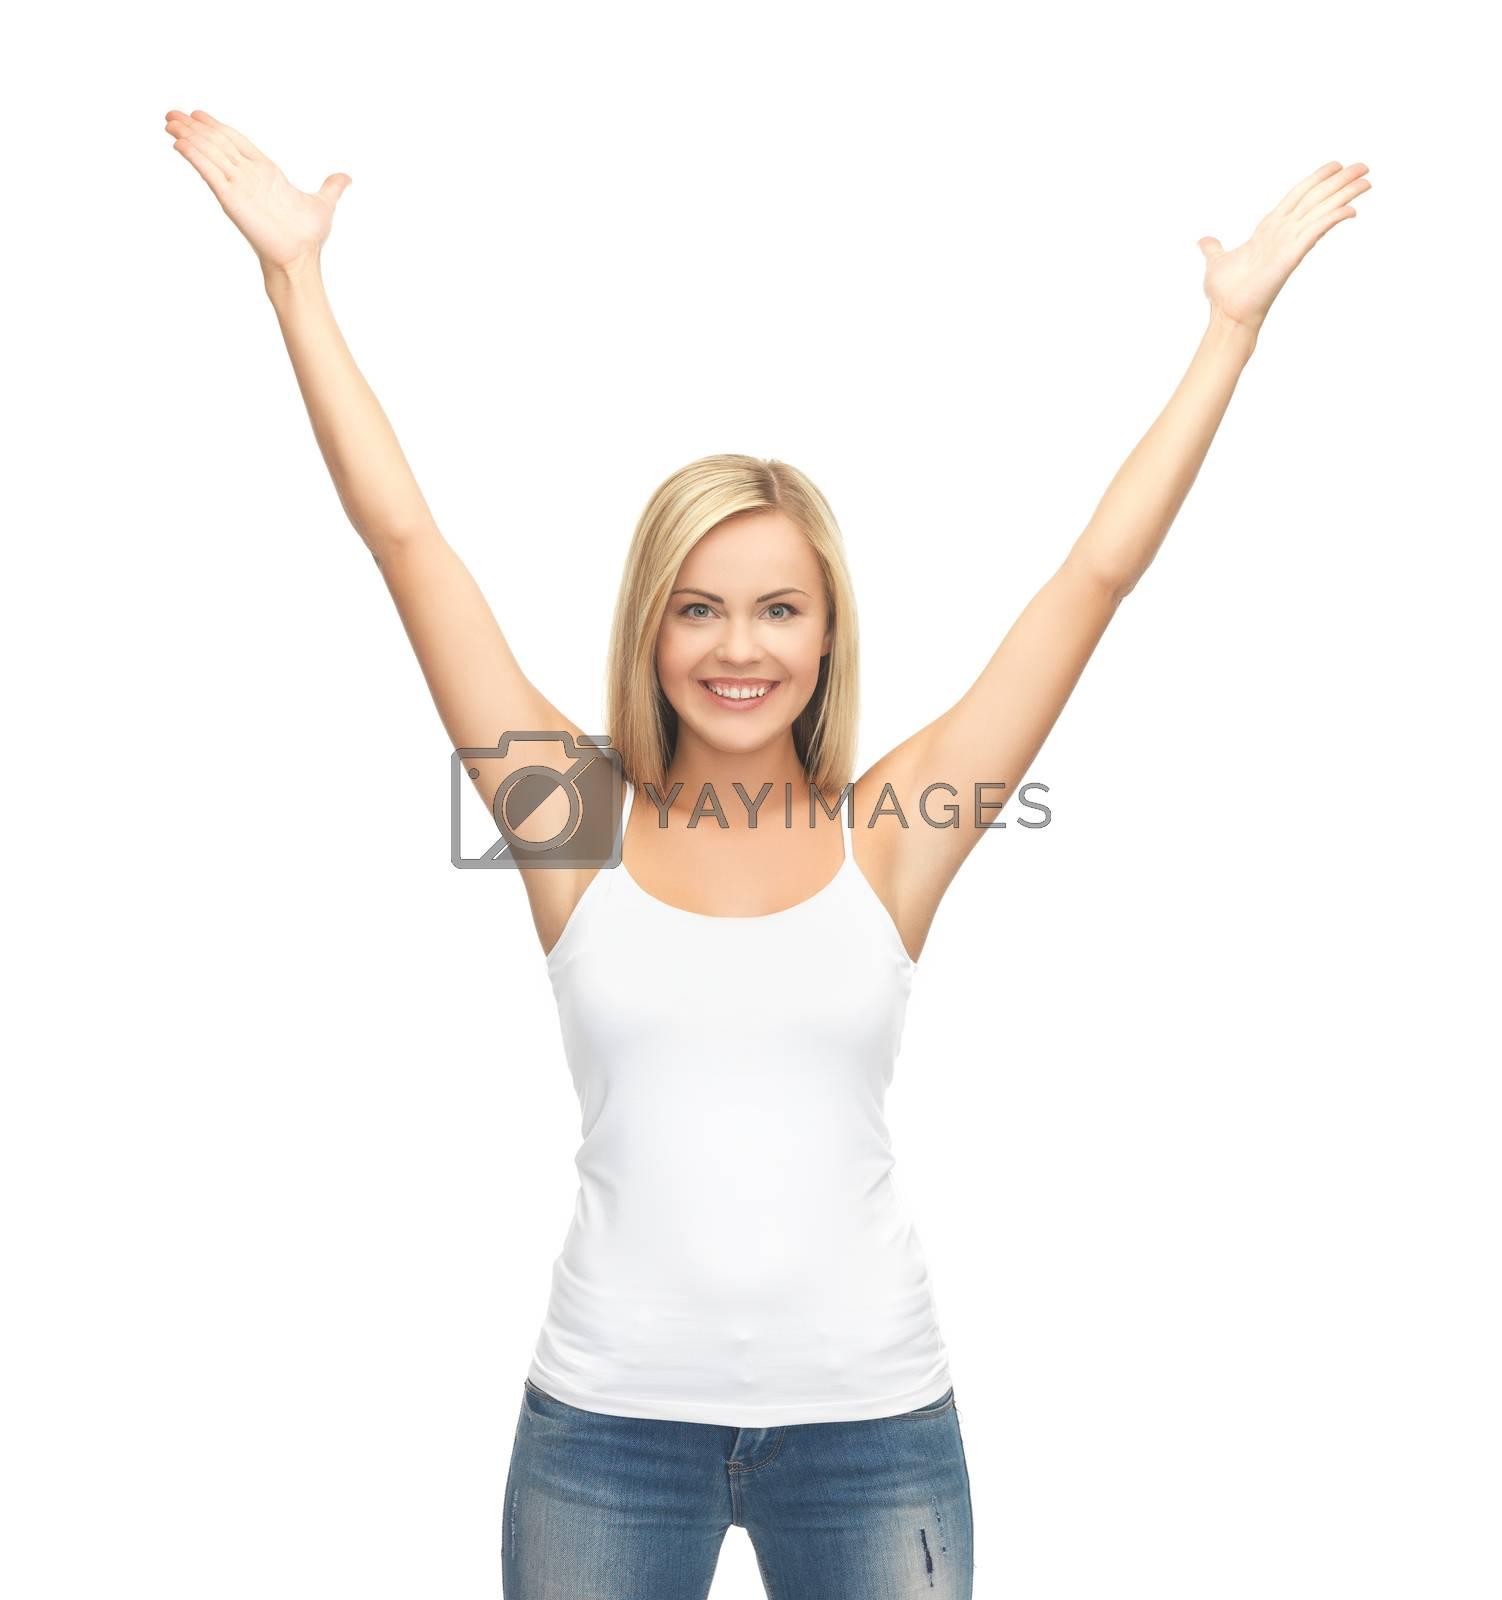 woman in blank white t-shirt by dolgachov